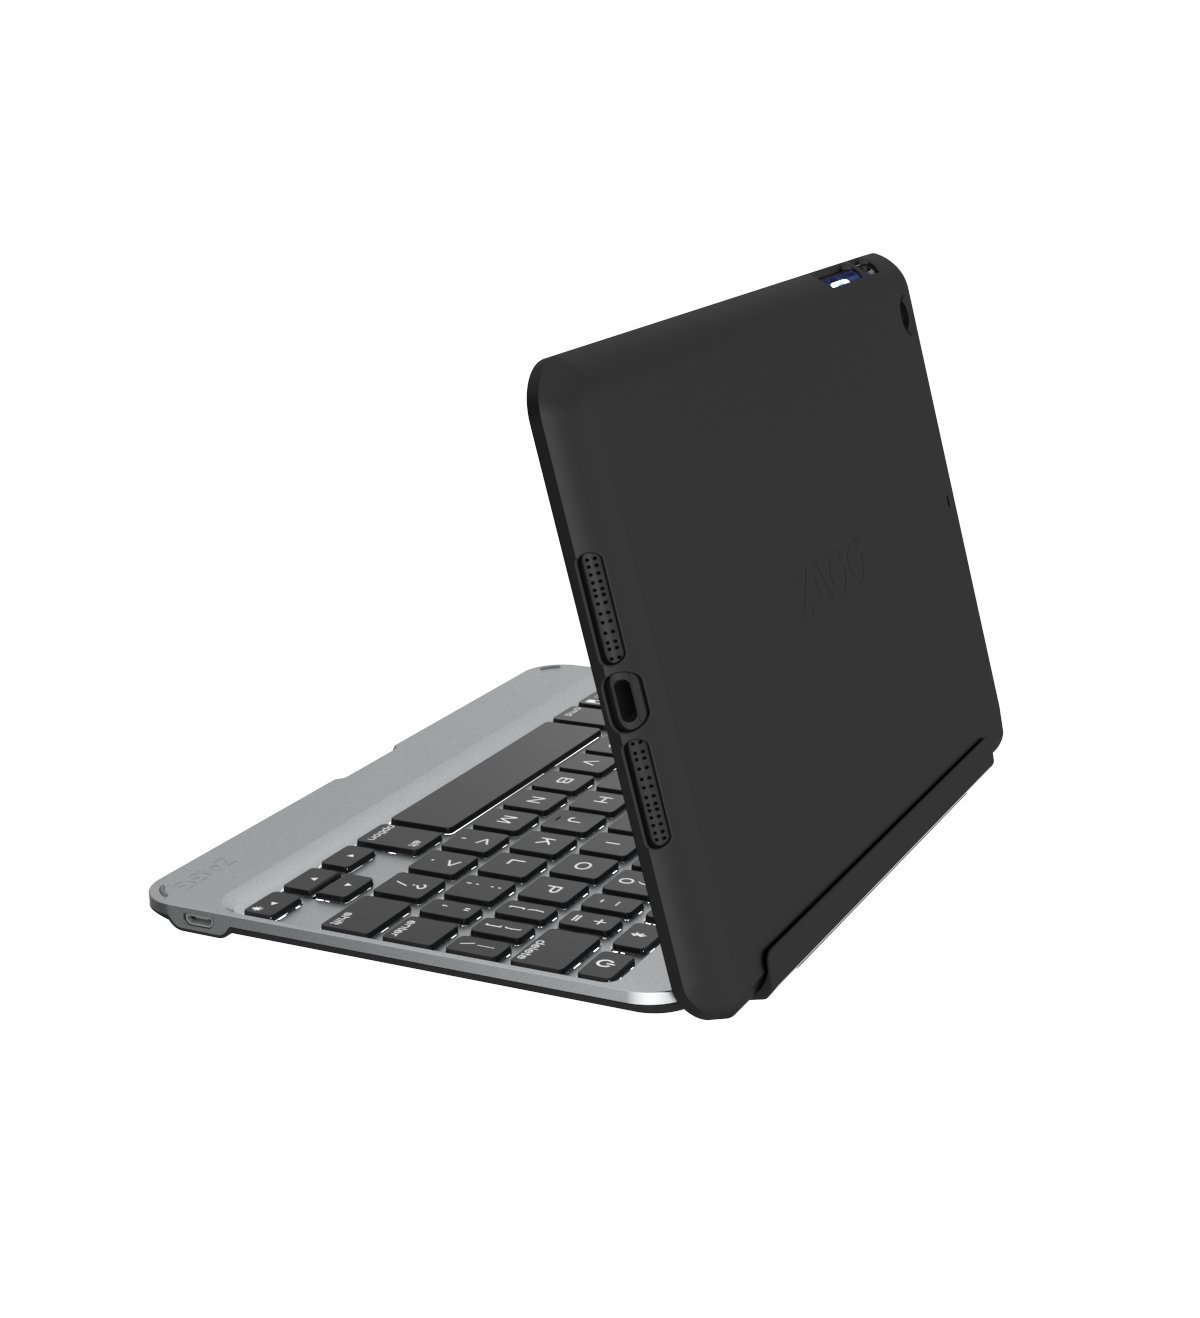 ZAGG Slim Book Ultrathin Case, Hinged with Detachable Bluetooth Keyboard for Apple iPad mini 4 - Black